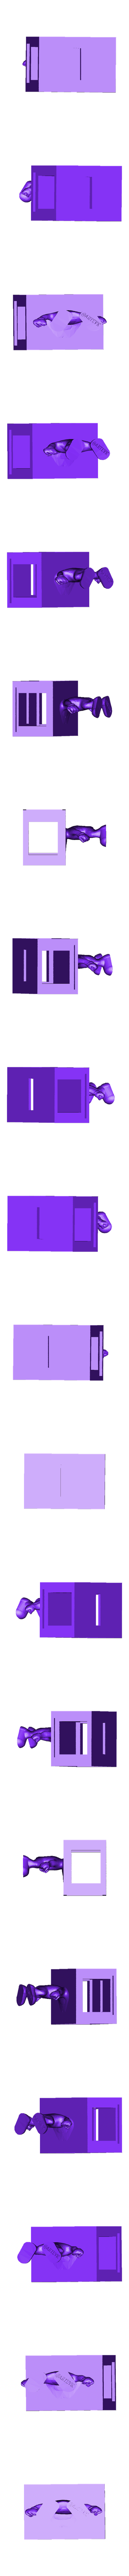 WATERTANK_7.stl Download free STL file FISH TANK FUNKO POP OR PEGGYBANK • 3D printer template, gaaraa